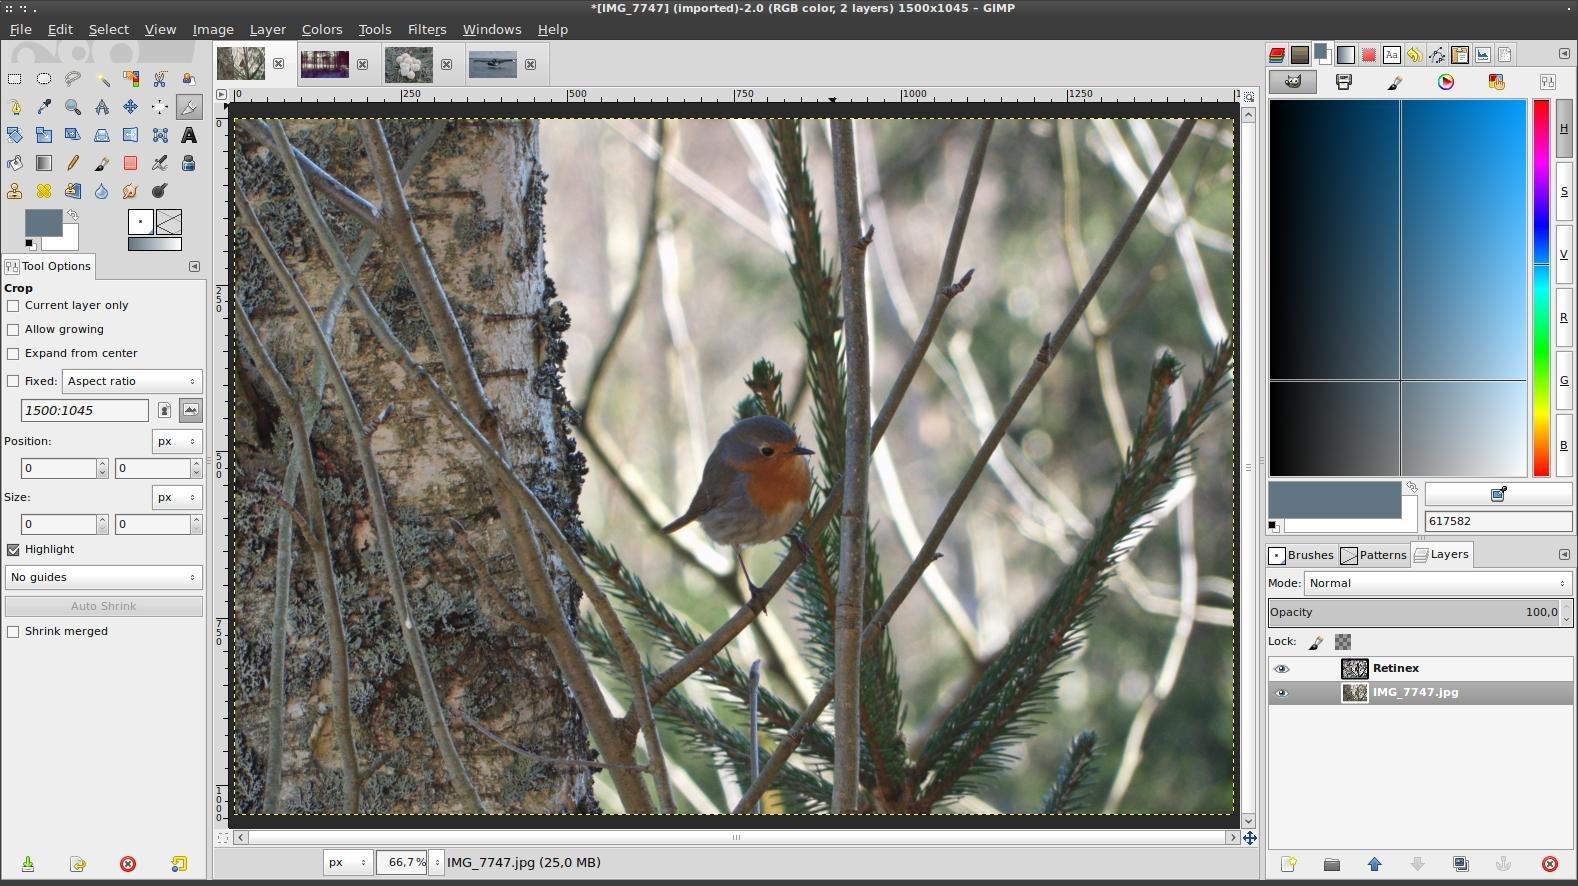 GIMP Screenshot with a loaded image